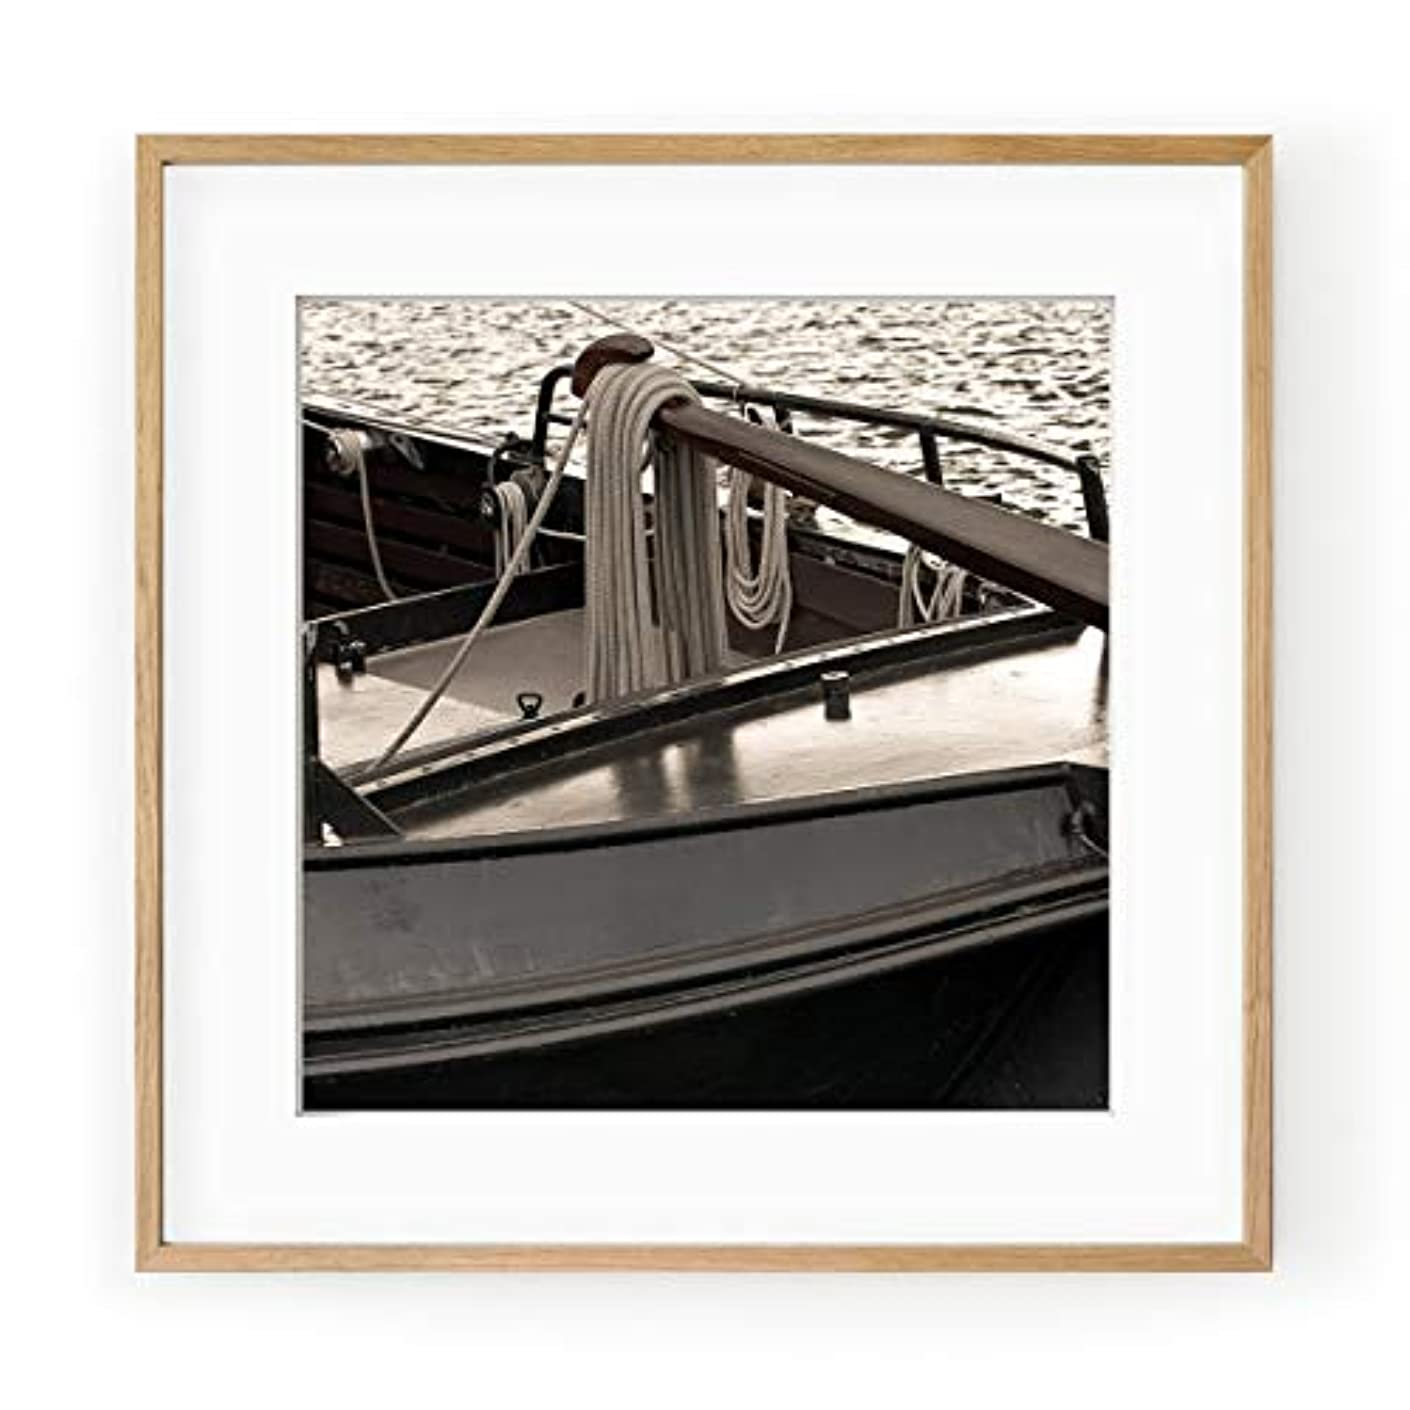 Dutch Boat, Aluminium Frame, with Mount, Multicolored, 40x40